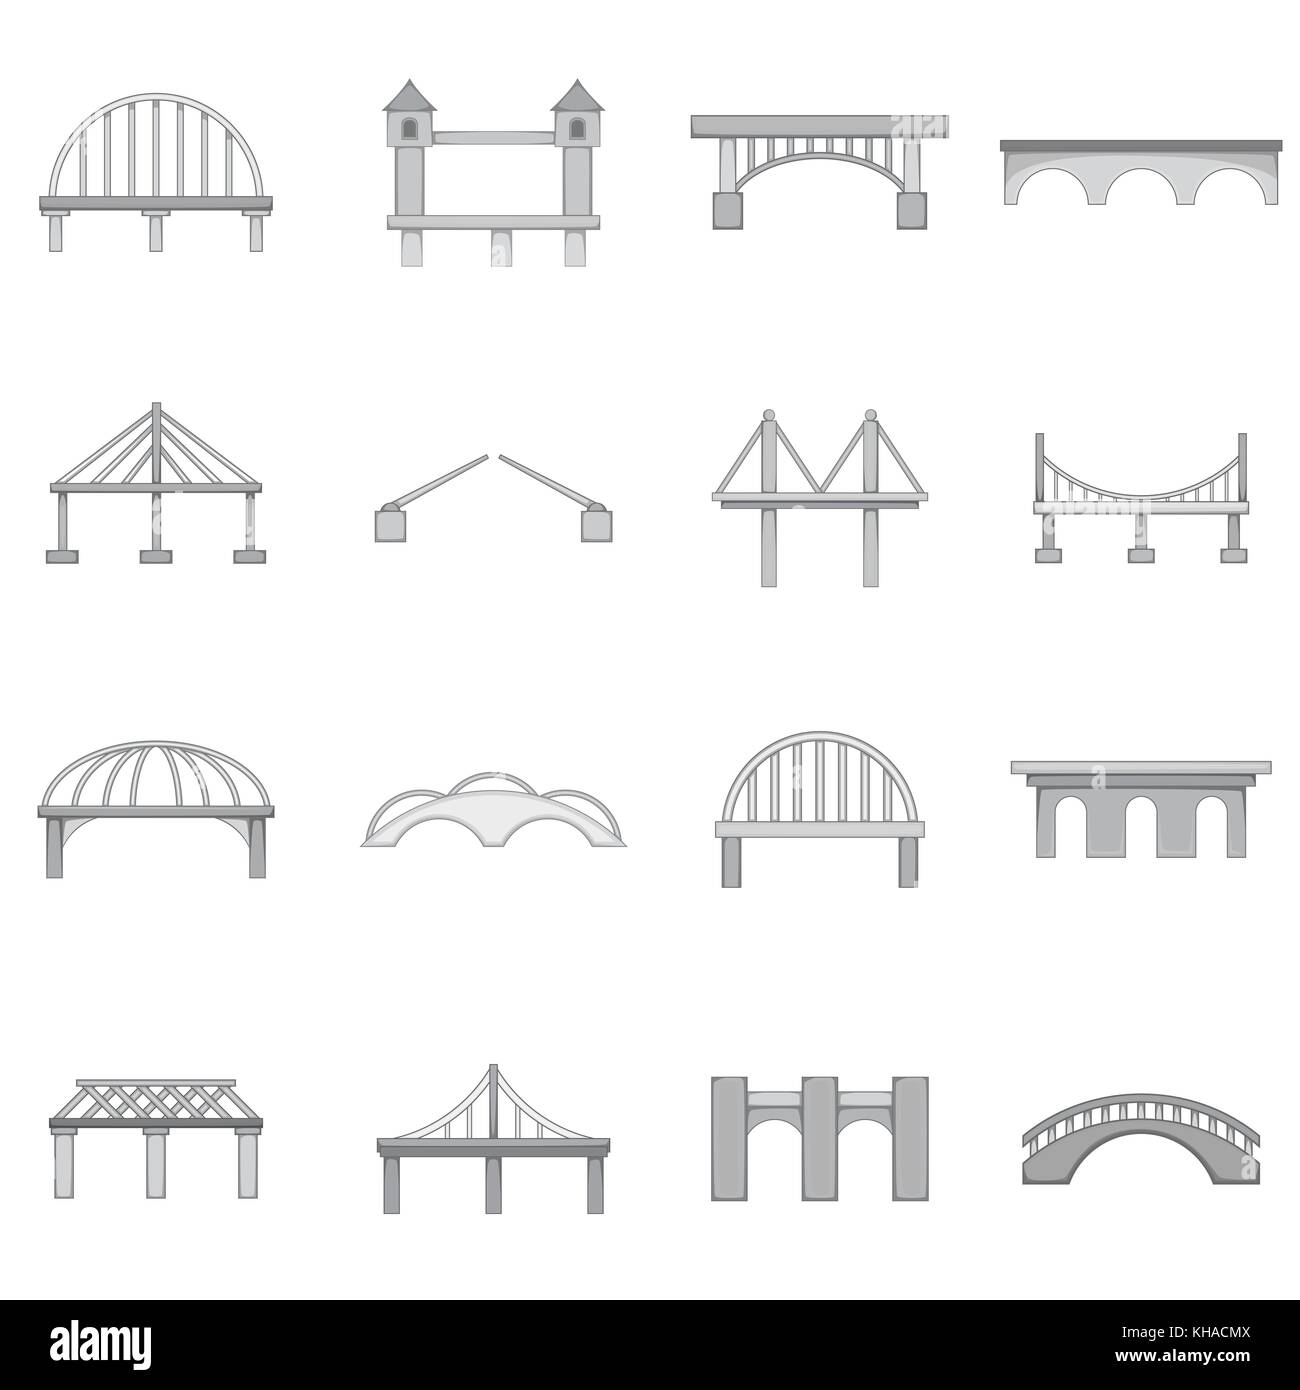 Bridge construction icons set, monochrome style - Stock Image